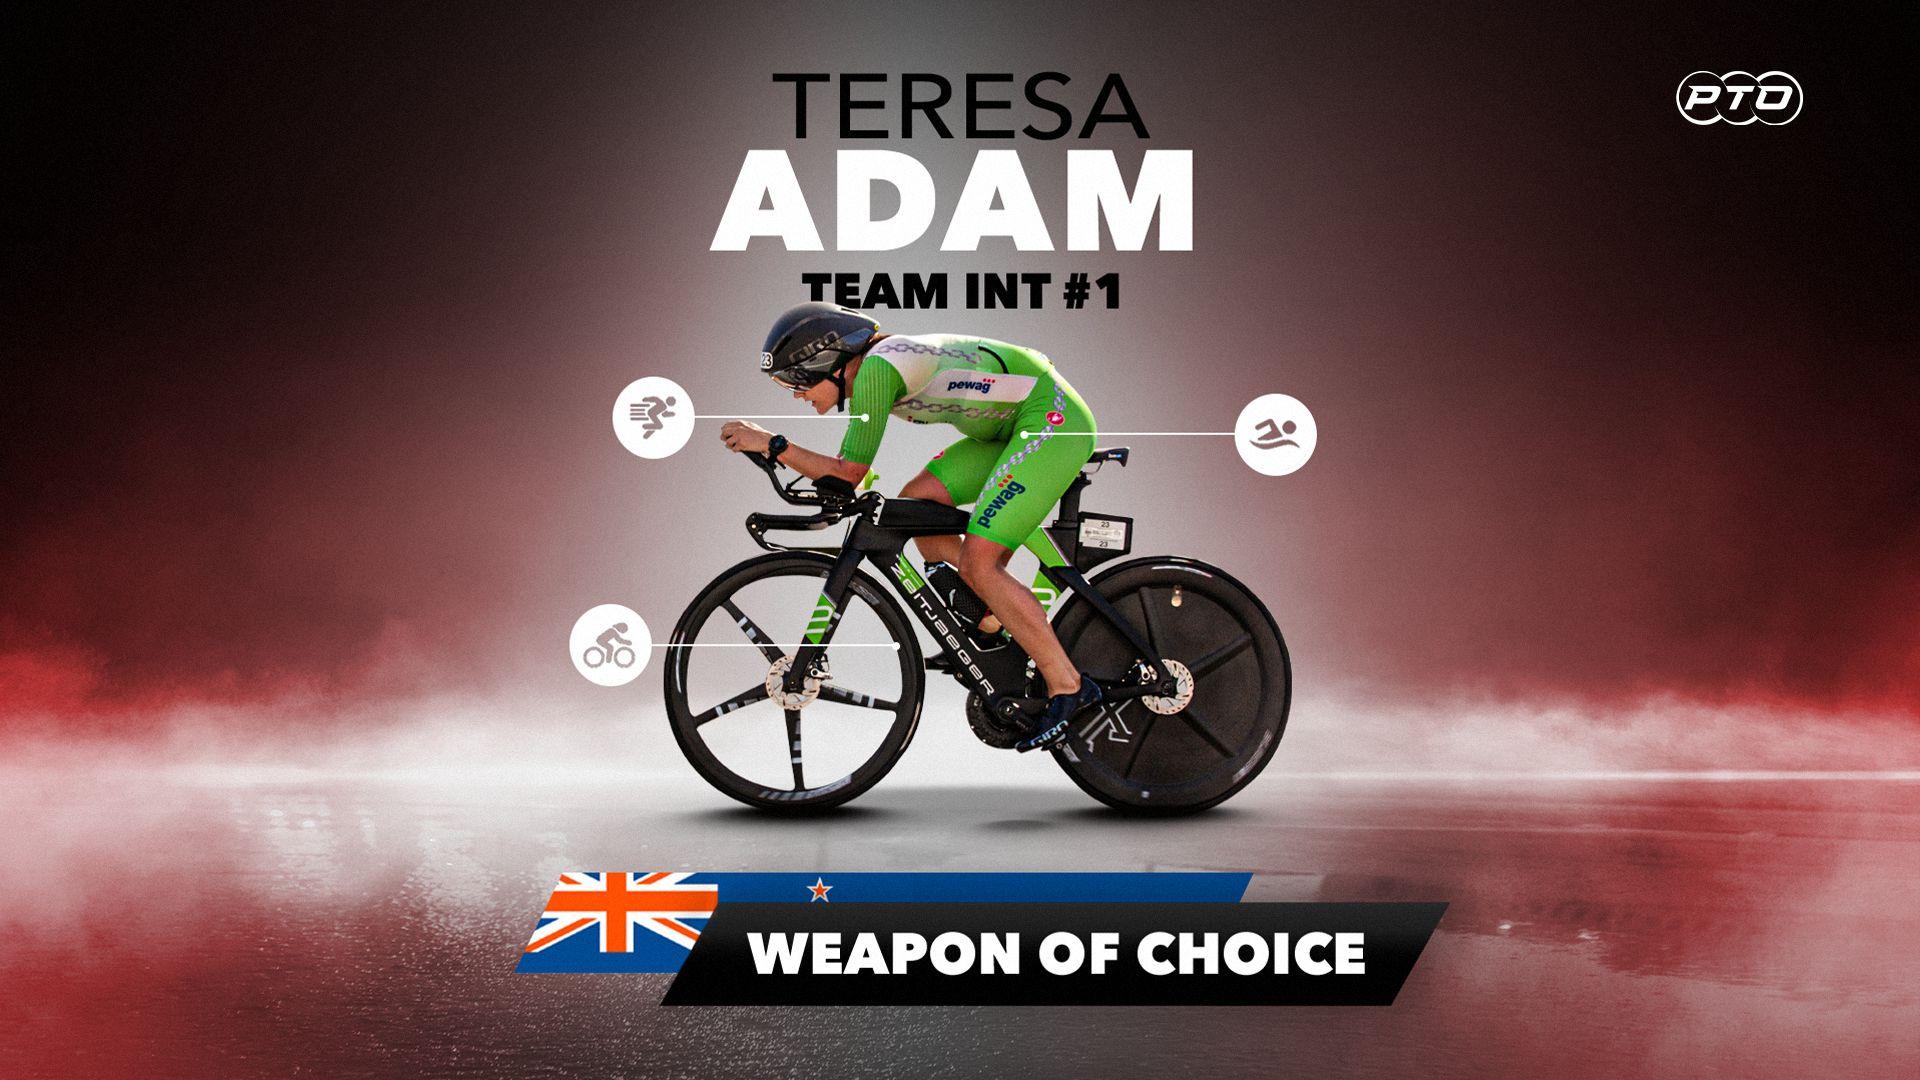 Weapon of Choice || Teresa Adam